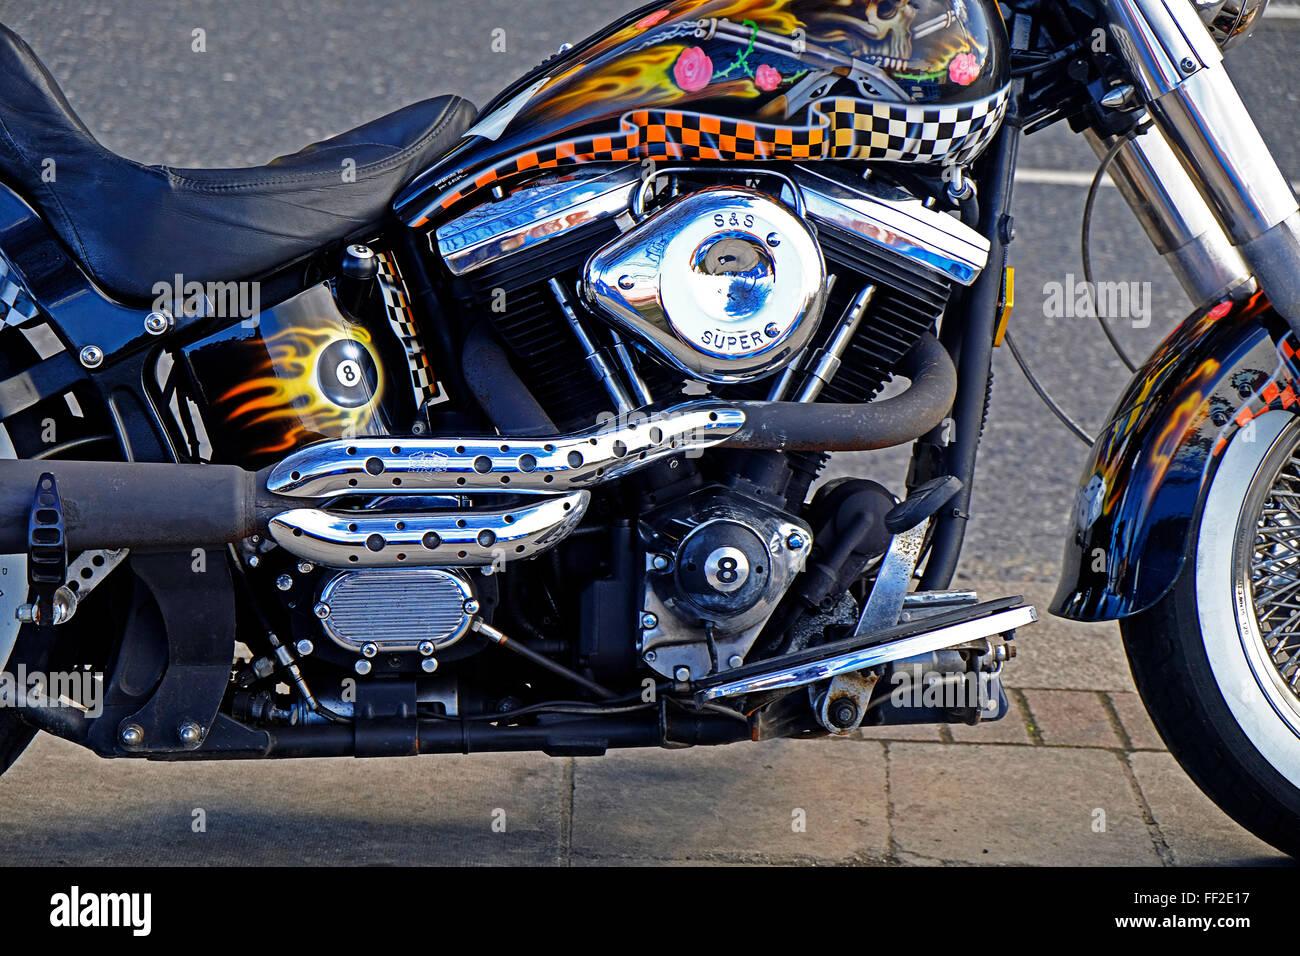 harley davidson motorcycle engine close up dublin ireland stock